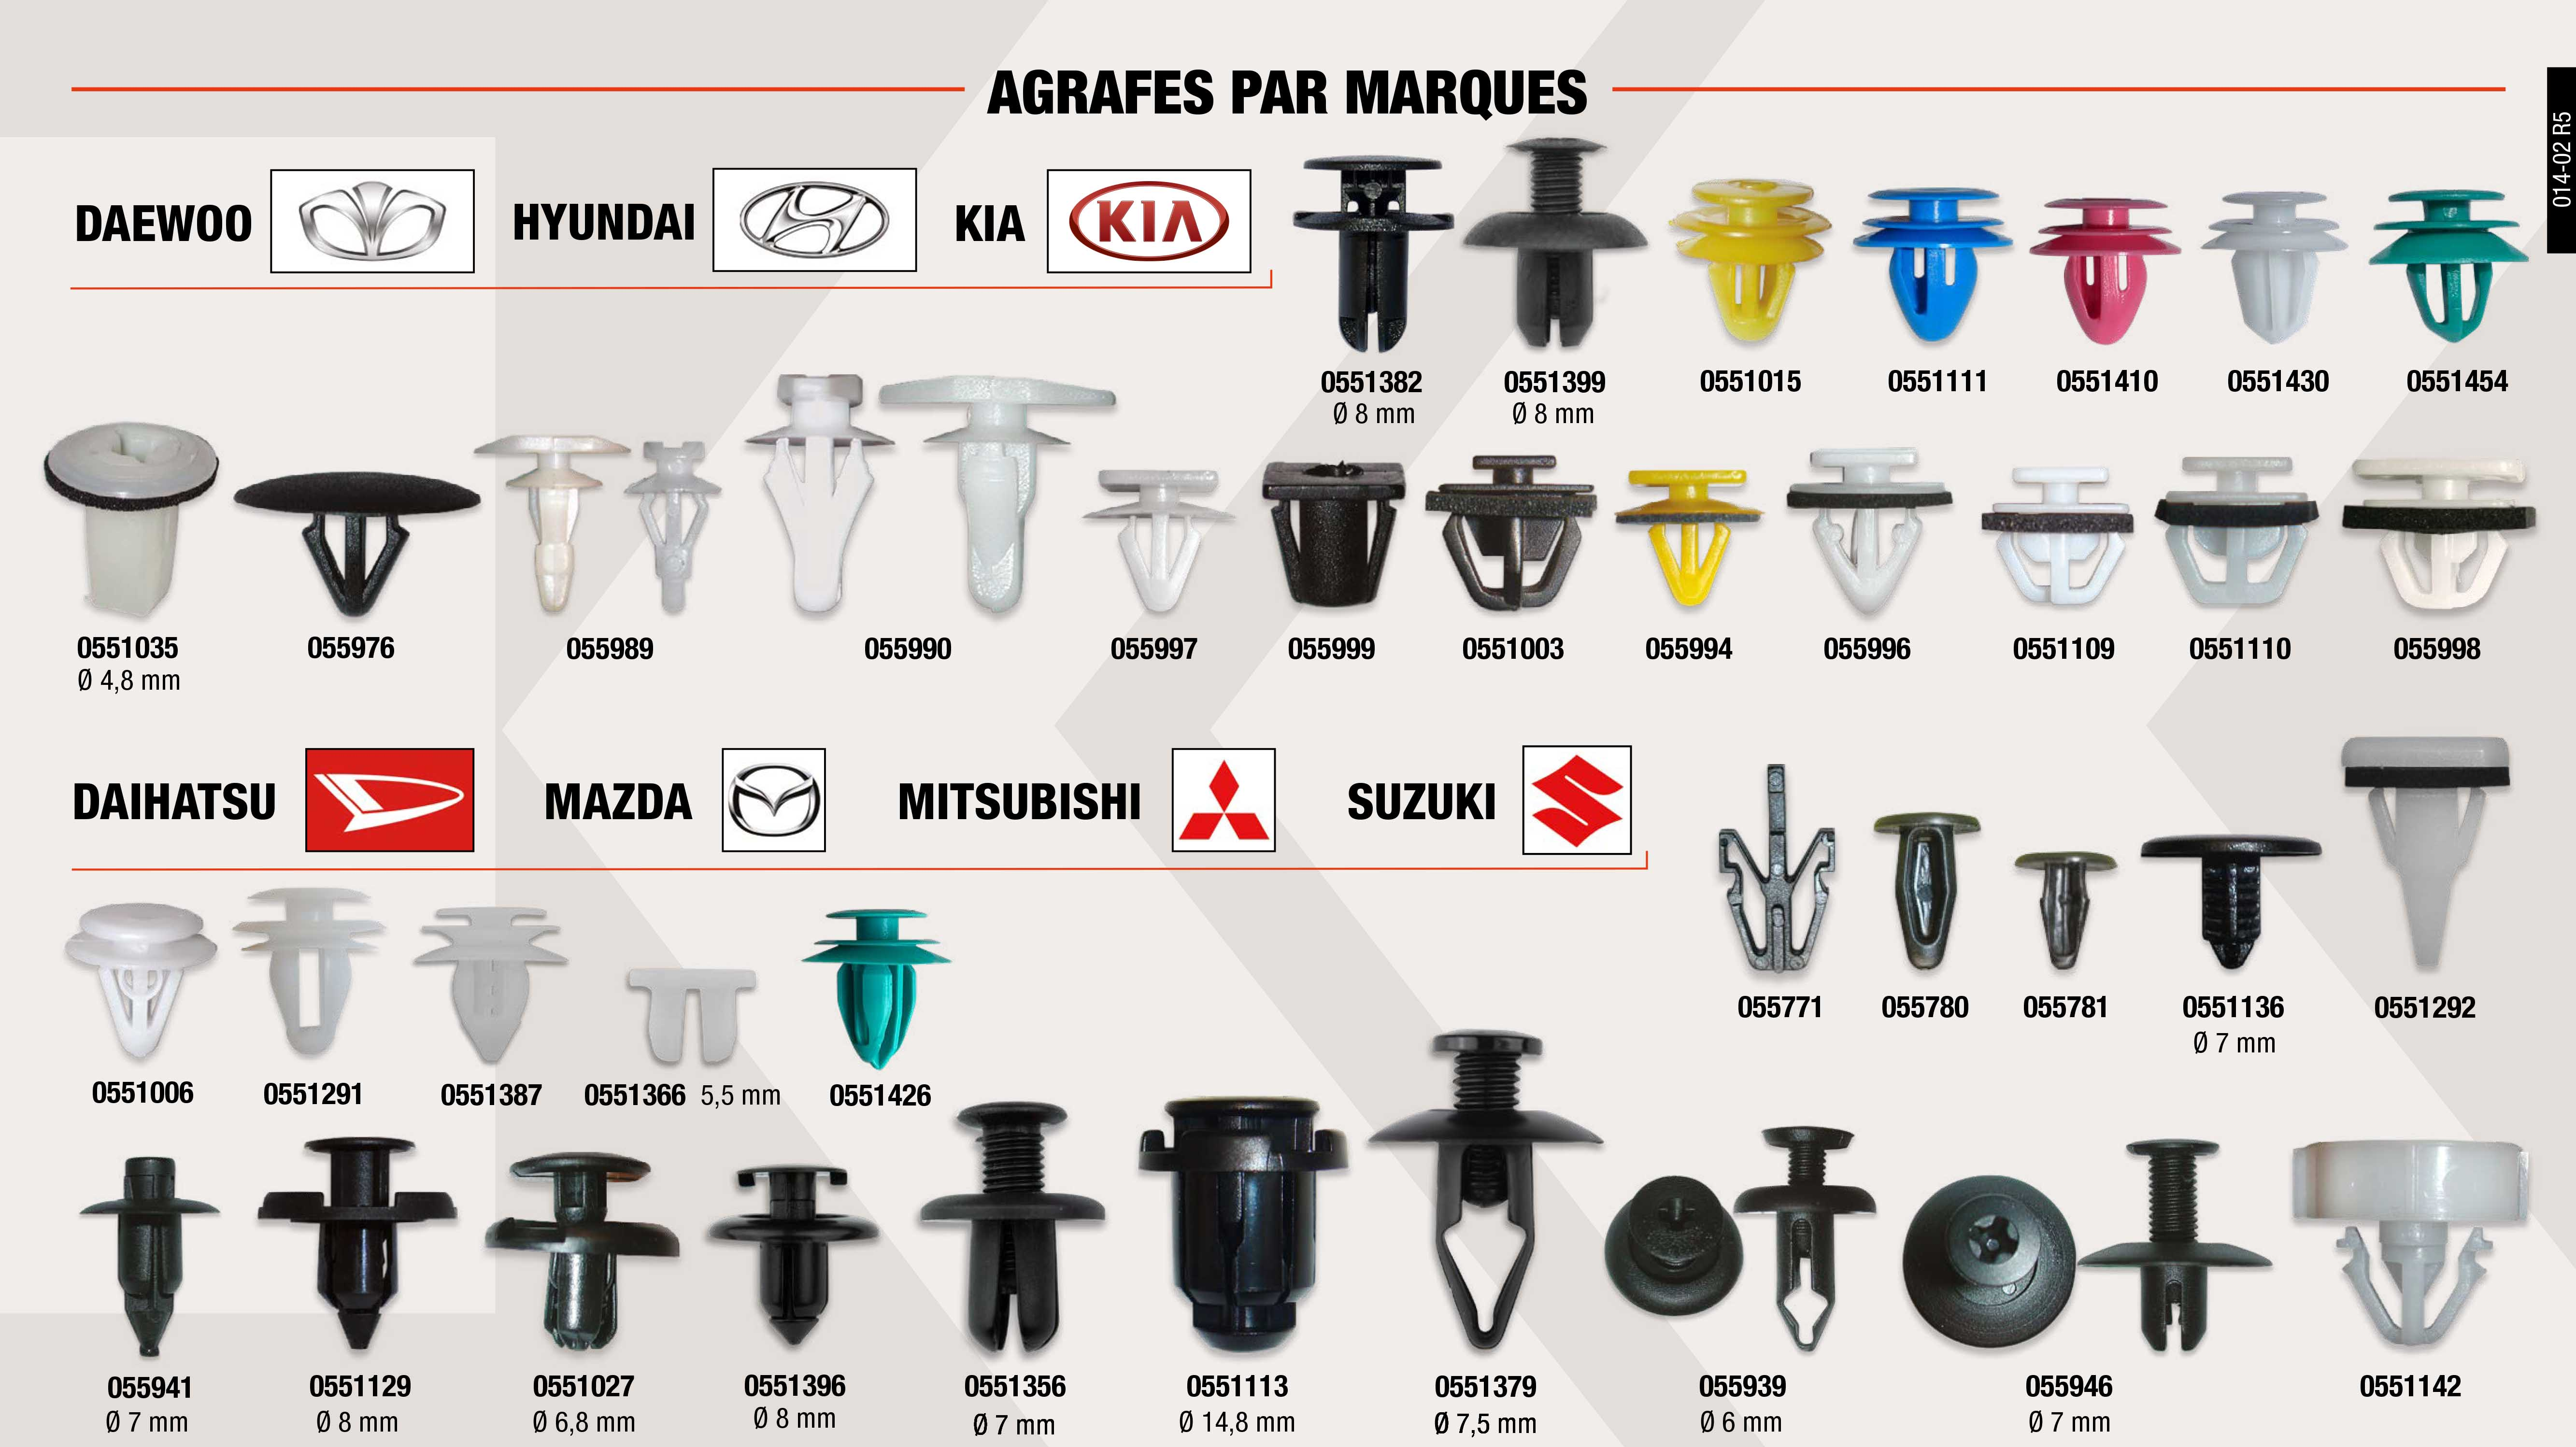 AGRAFE P.PORTE HYUNDAI JAUNE 17X12,5x8MM                    ,  AGRAFE MOUL.LAT.HYUNDAI BLANC 15,6X12,7X11MM                ,  BOUTON FIXATION MAZDA                                       ,  BOUTON ISOL.CAPOT FIAT NOIR 12X6X19MM                       ,  AGRAFE PVC TAPI-PARE-HON-MITS-NISS-NOIR.20X7,5X8MM          ,  AGRAFE MOUL.LAT.HYUNDAI BLANC 19,2X15,2X9MM                 ,  RIVET RADIATEUR-ROUE MITSUB. NOIR 16X14MM                   ,  CHEVIL.PVC PORT-MOUL.LAT.HYUND NAT. 20X17,8X9MM             ,  BOUTON COMP.MOTEUR HYUNDAI NOIR 26X14X4MM                   ,  AGRAFE MOUL.LATERALE HYUNDAI BLANC 10X13.6MM                ,  AGRAFE MOUL.LATERALE HYNDAI-KIA BLANC 10X14MM               ,  AGRAFE PAREBRISE FIAT-SUZU BLANC 12,87X7MM                  ,  AGRAFE MOUL.LAT SUZUKI BLC 15,7X11X8MM                      ,  RIVET TAPISS. SUZUKI NOIR 15X13MM                           ,  RIVET PARAP. SUZUKI NOIR 20X9MM                             ,  RIVET ROUE FIAT-SUZUKI-TOYOTA NOIR Ø7X20X10X3MM             ,  AGRAFE RADIATEUR HONDA-MAZDA-TOYOTA                         ,  AGRAFE MOUL.LAT.HYUNDAI JAUNE 15X11,8X10MM                  ,  AGRAFE MOUL.LAT.HYUNDAI. BLANC 16X10,5X8MM                  ,  AGRAFE MOUL.LAT.HYUNDAI NOIR 12,7X11X10,6MM                 ,  AGRAFE MOUL.LAT.HYUNDAI NOIR. 17,7X13,7X10MM                ,  BOUTON FIXATION MAZDA                                       ,  RIVET PAS.ROUE FIAT SUZUKI NOIR                             ,  AGRAFE CAOUTCH PTA.HYUNDAI BLANC 9X10,9X5,3MM               ,  RIVET TAPISS. SUZUKI NOIR 16X12X9MM                         ,  AGRAFE TAPIS.PORTE MITSUBISHI BLANC 11,5X8,6MM              ,  AGRAFE CAOUTCH. PTA HYUNDAI BLANC 9,6X12x5,7MM              ,  AGRAFE MOUL.LATERAL. MITSUBISHI BLANC 21X6,2MM              ,  AGRAFE PANNEAU PORTE HYUNDAI BLEU 12X9.7MM                  ,